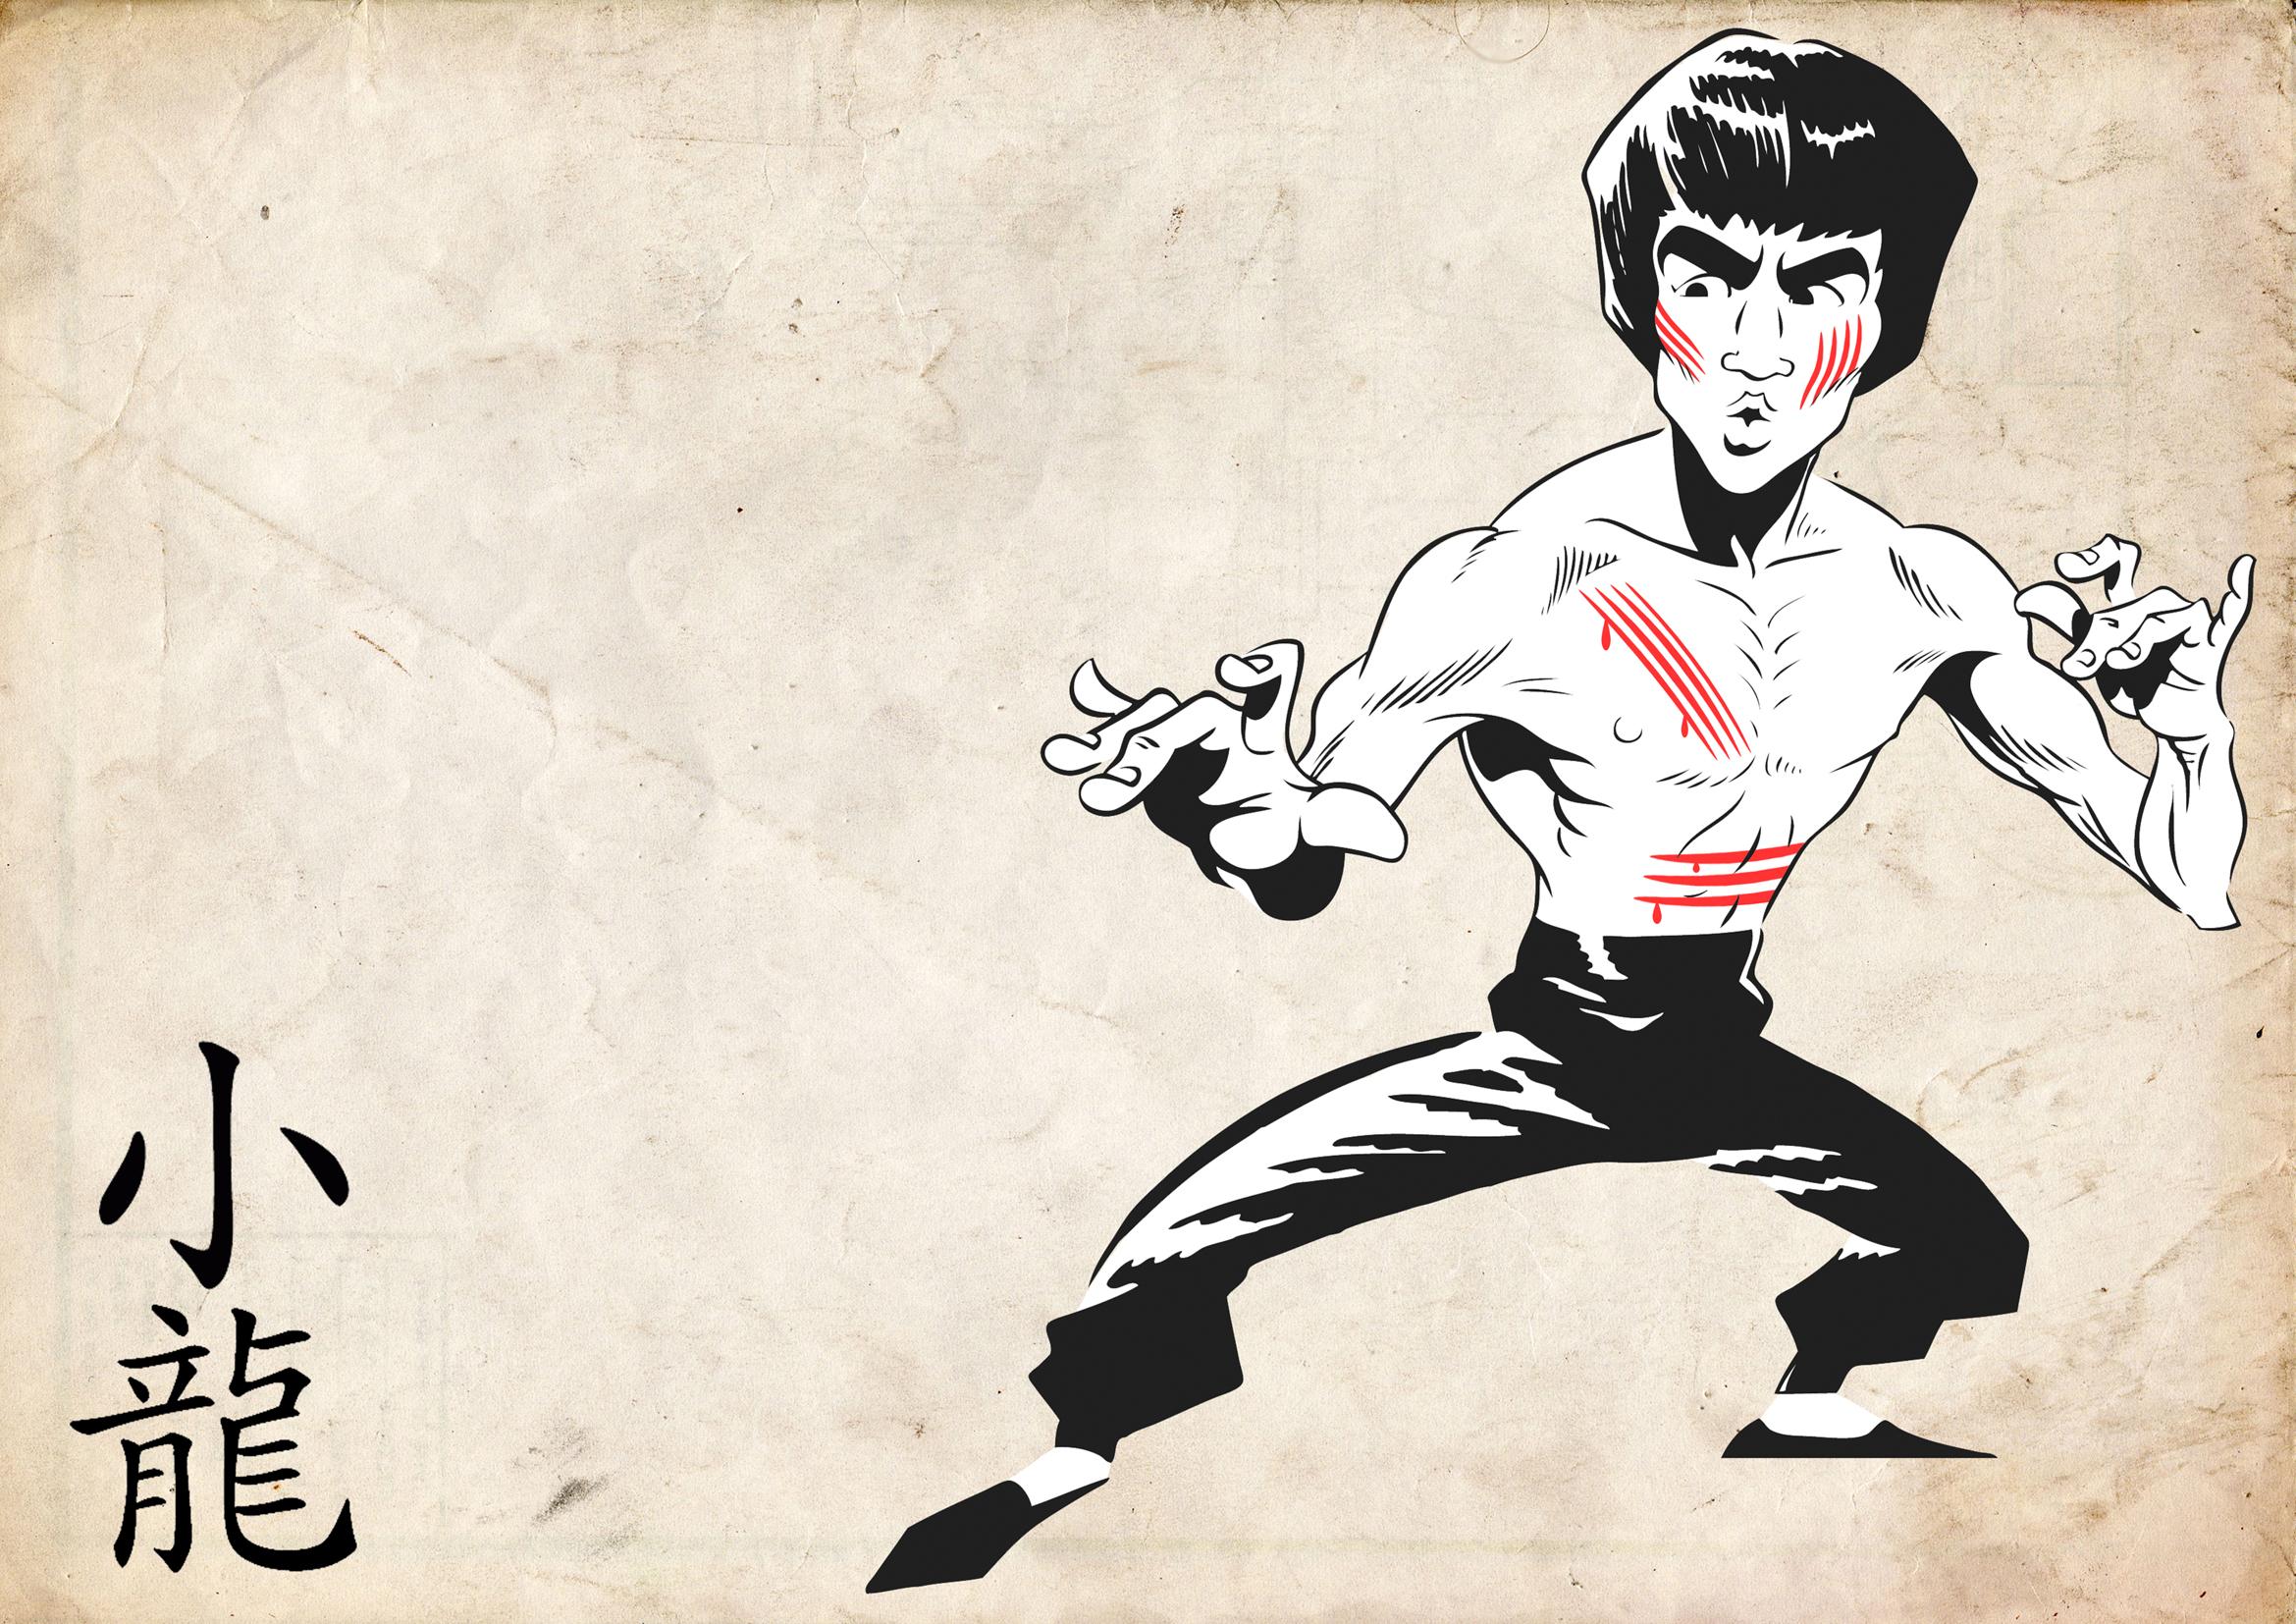 Bruce Lee Wallpapers HD cartoon